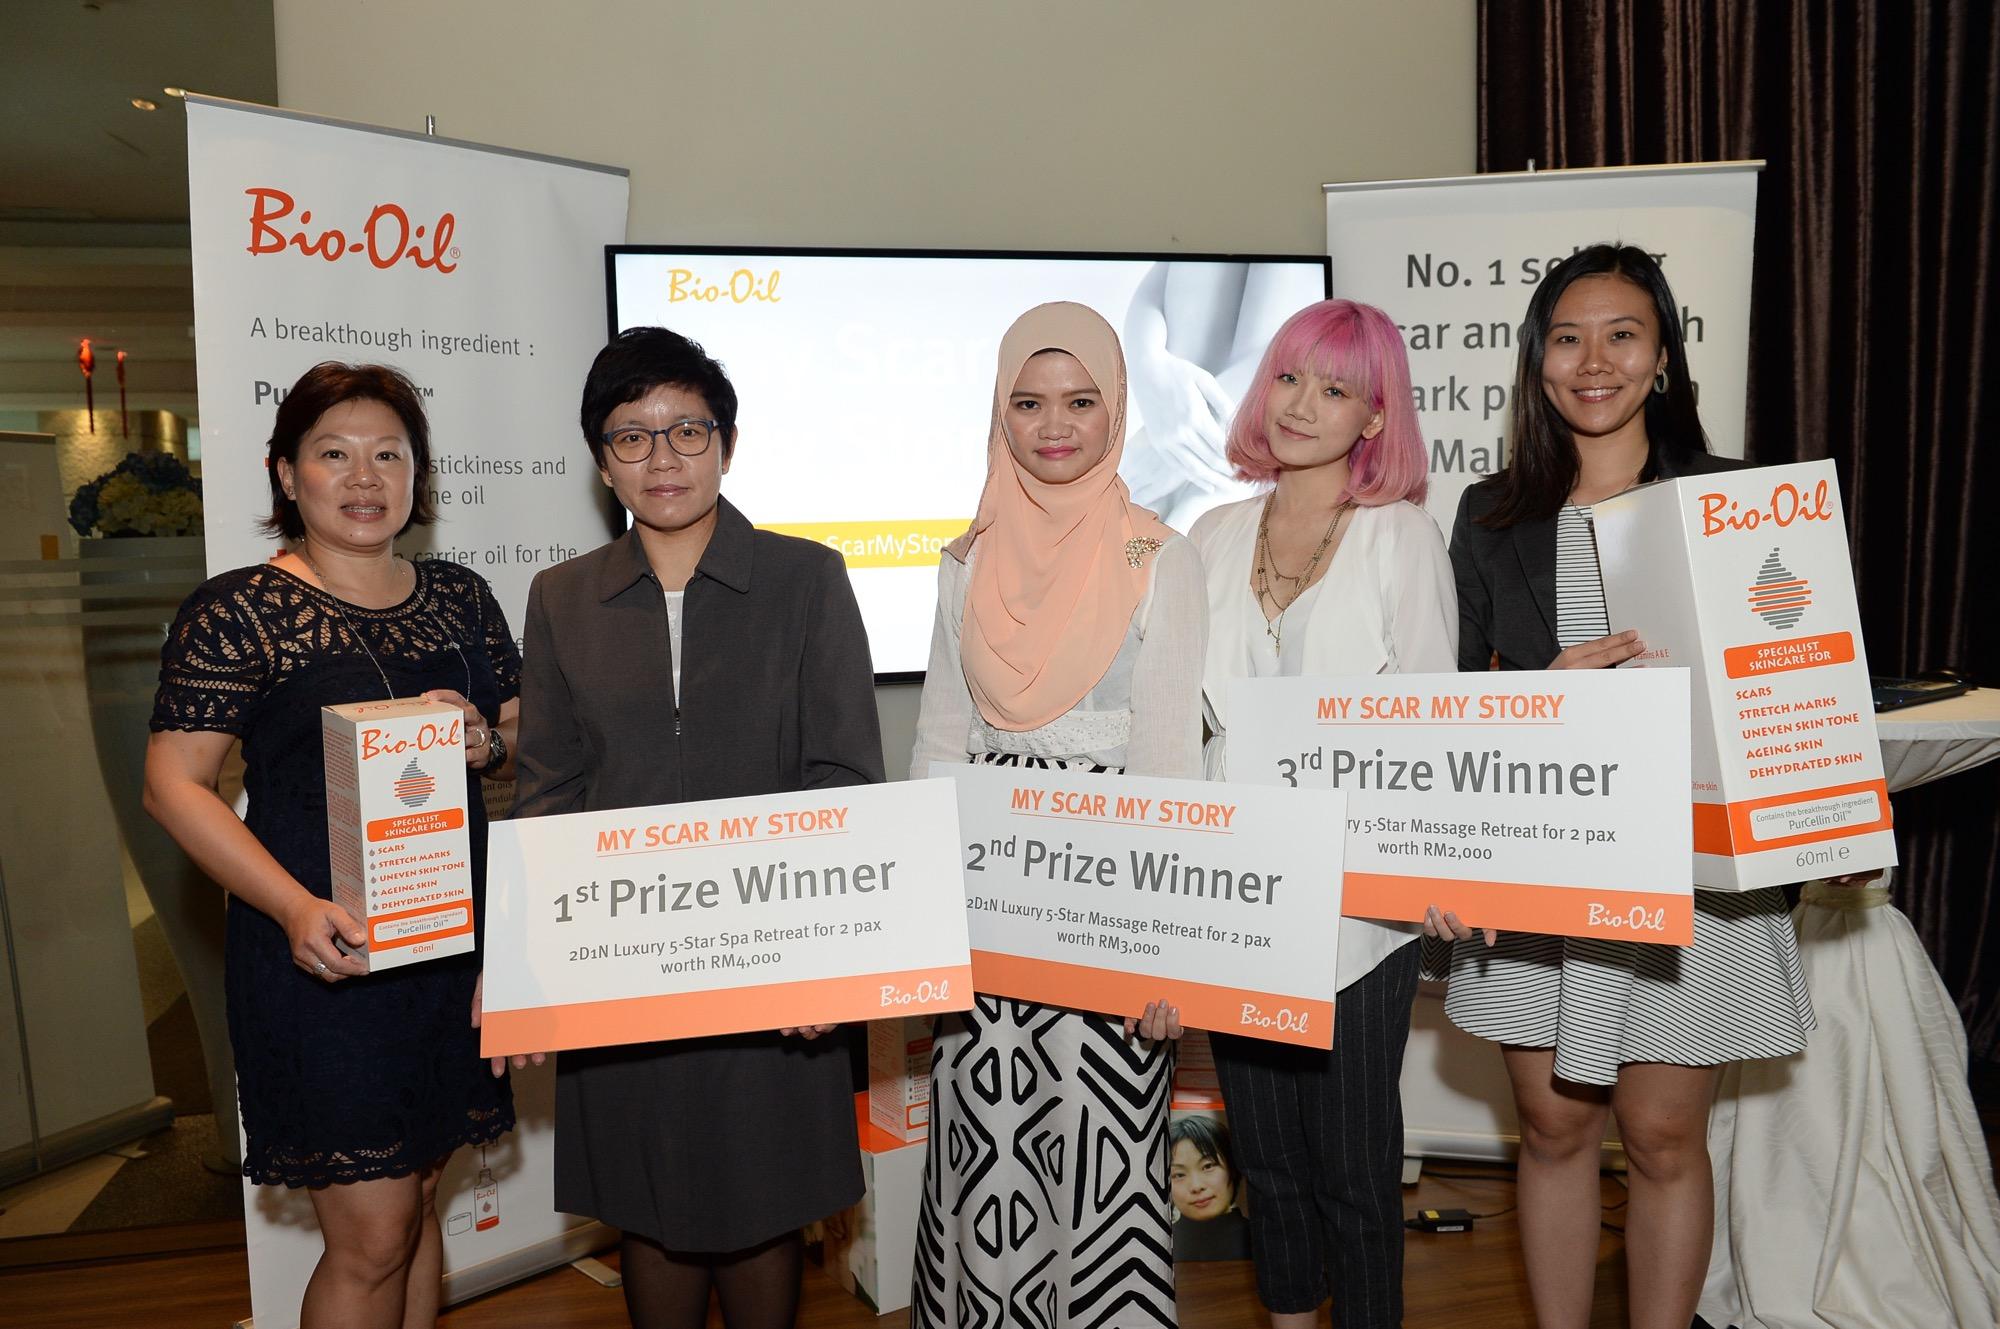 L to R- Low Hooi Wan, Caroline Yap, Hajarul Falenna, Arisa Chow, Stephanie Ng